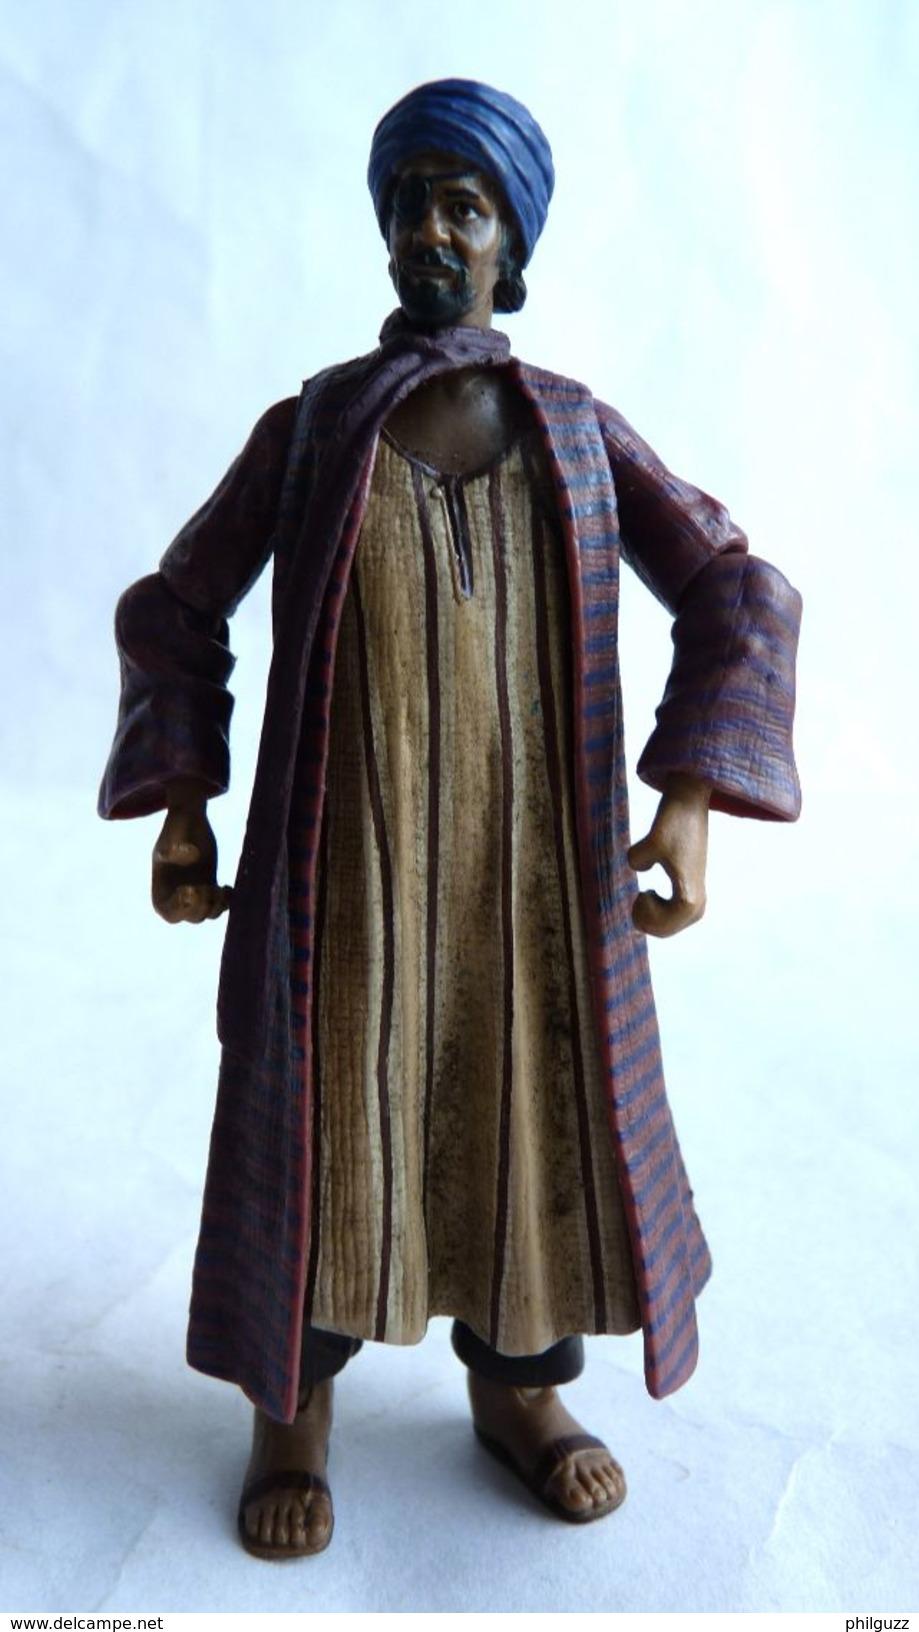 INDIANA JONES - RAIDERS OF THE LOST ARK - HASBRO 2008 - MONKEY MAN SANS SON SINGE - Figurines